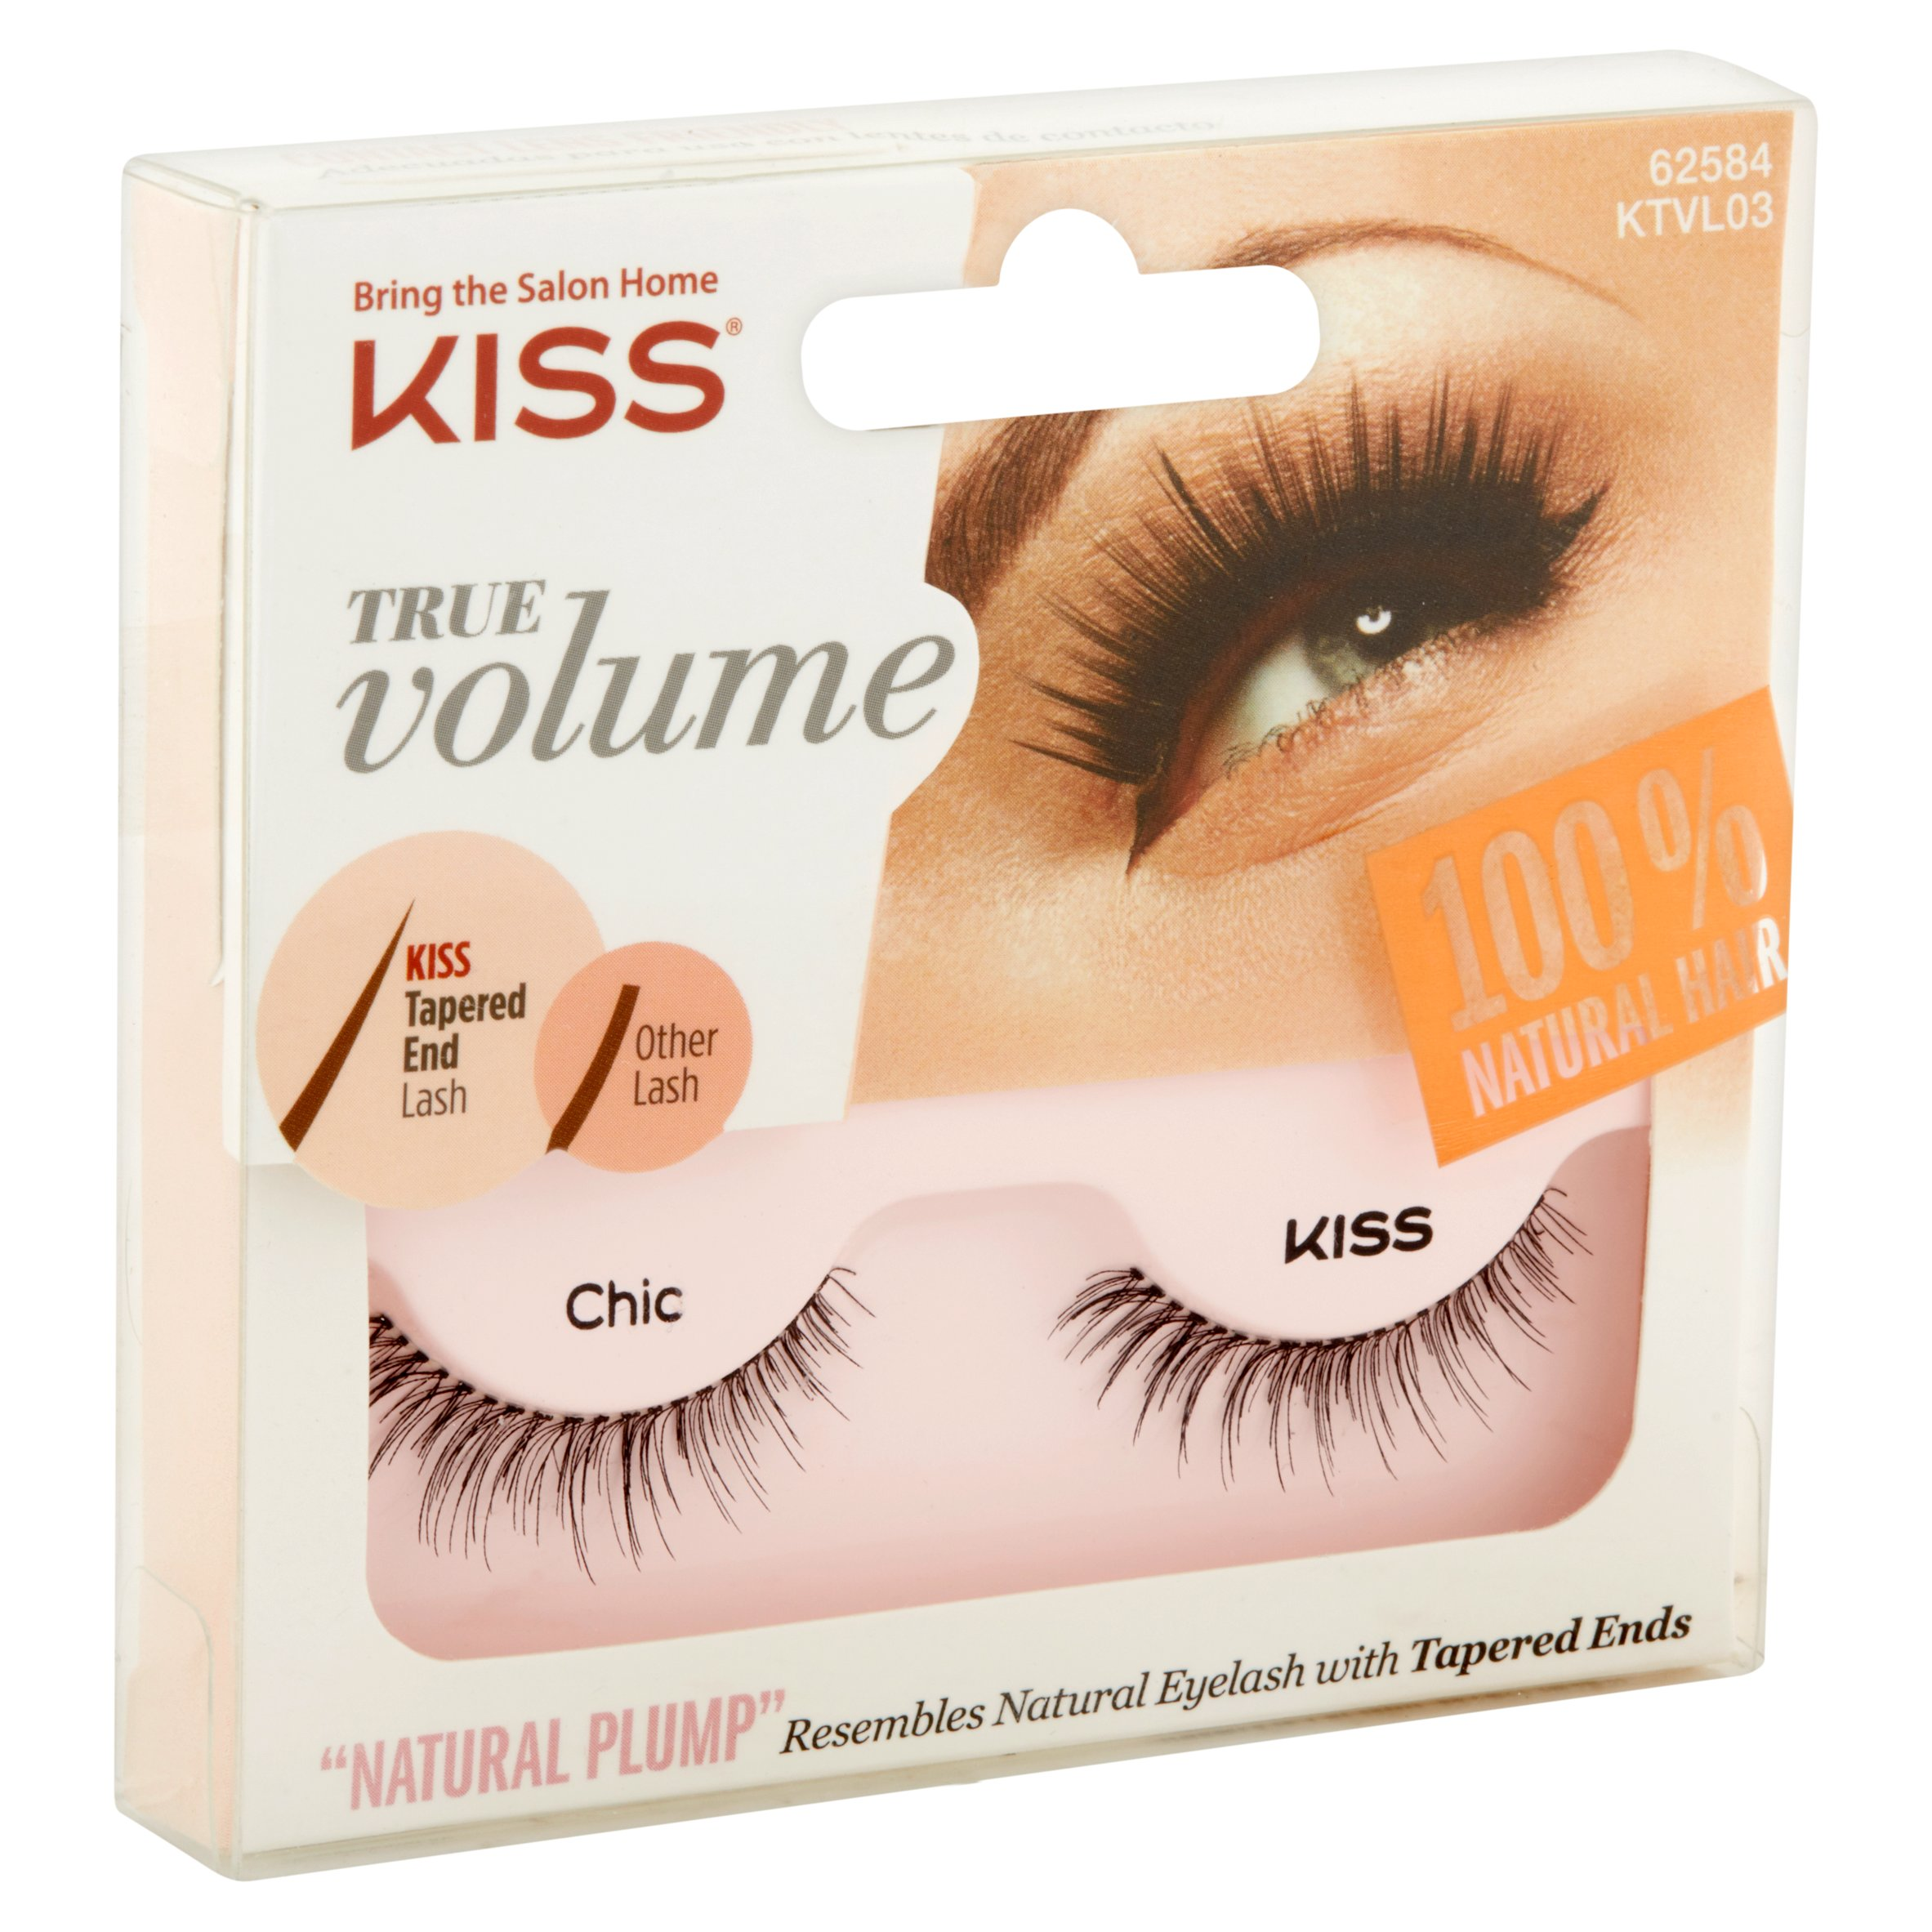 Kiss True Volume Natural Plump Eyelashes Chic Walmart